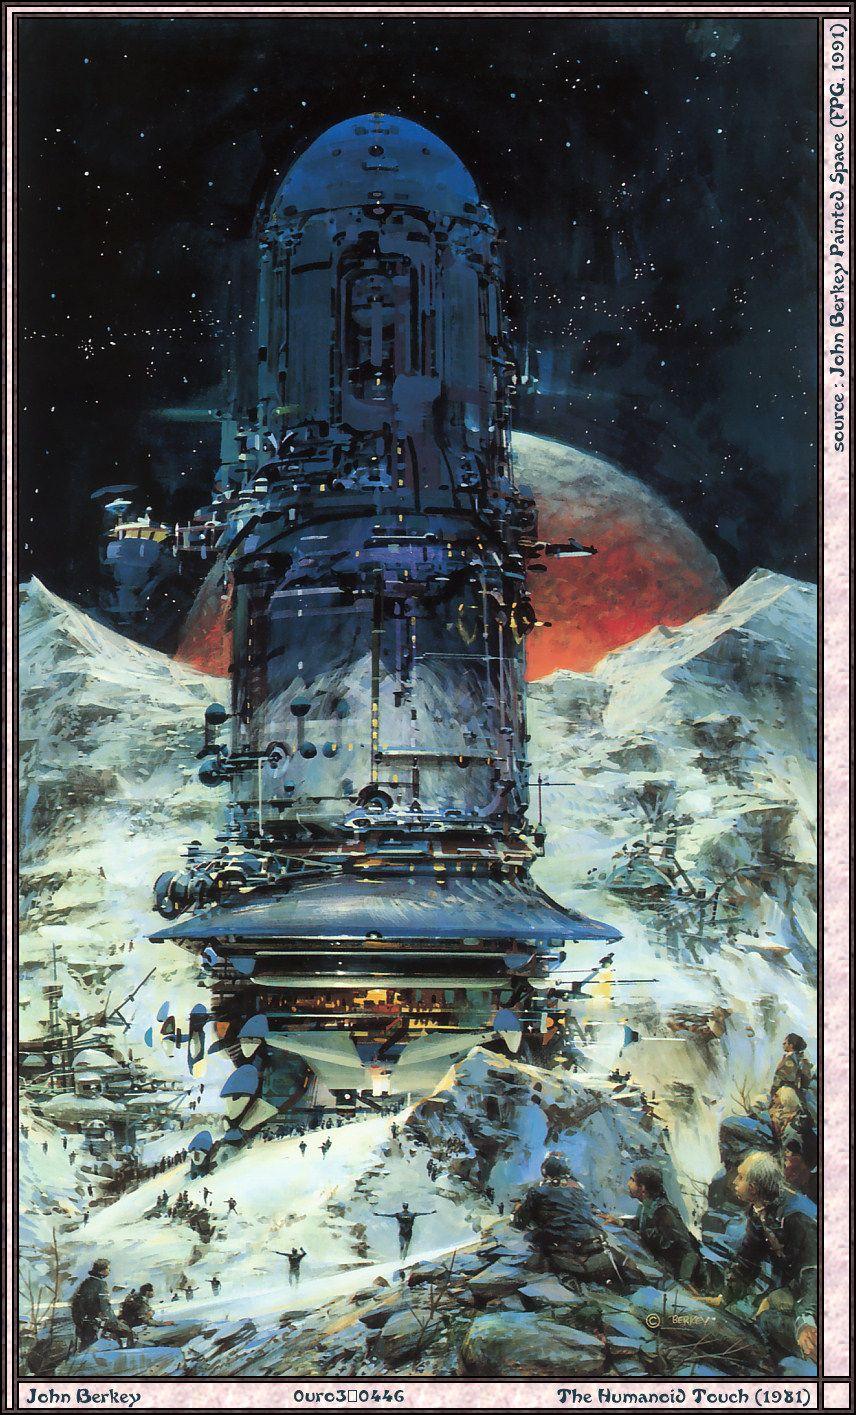 Book Cover Artist Science Fiction : John berkey science fiction book cover artist on pinterest